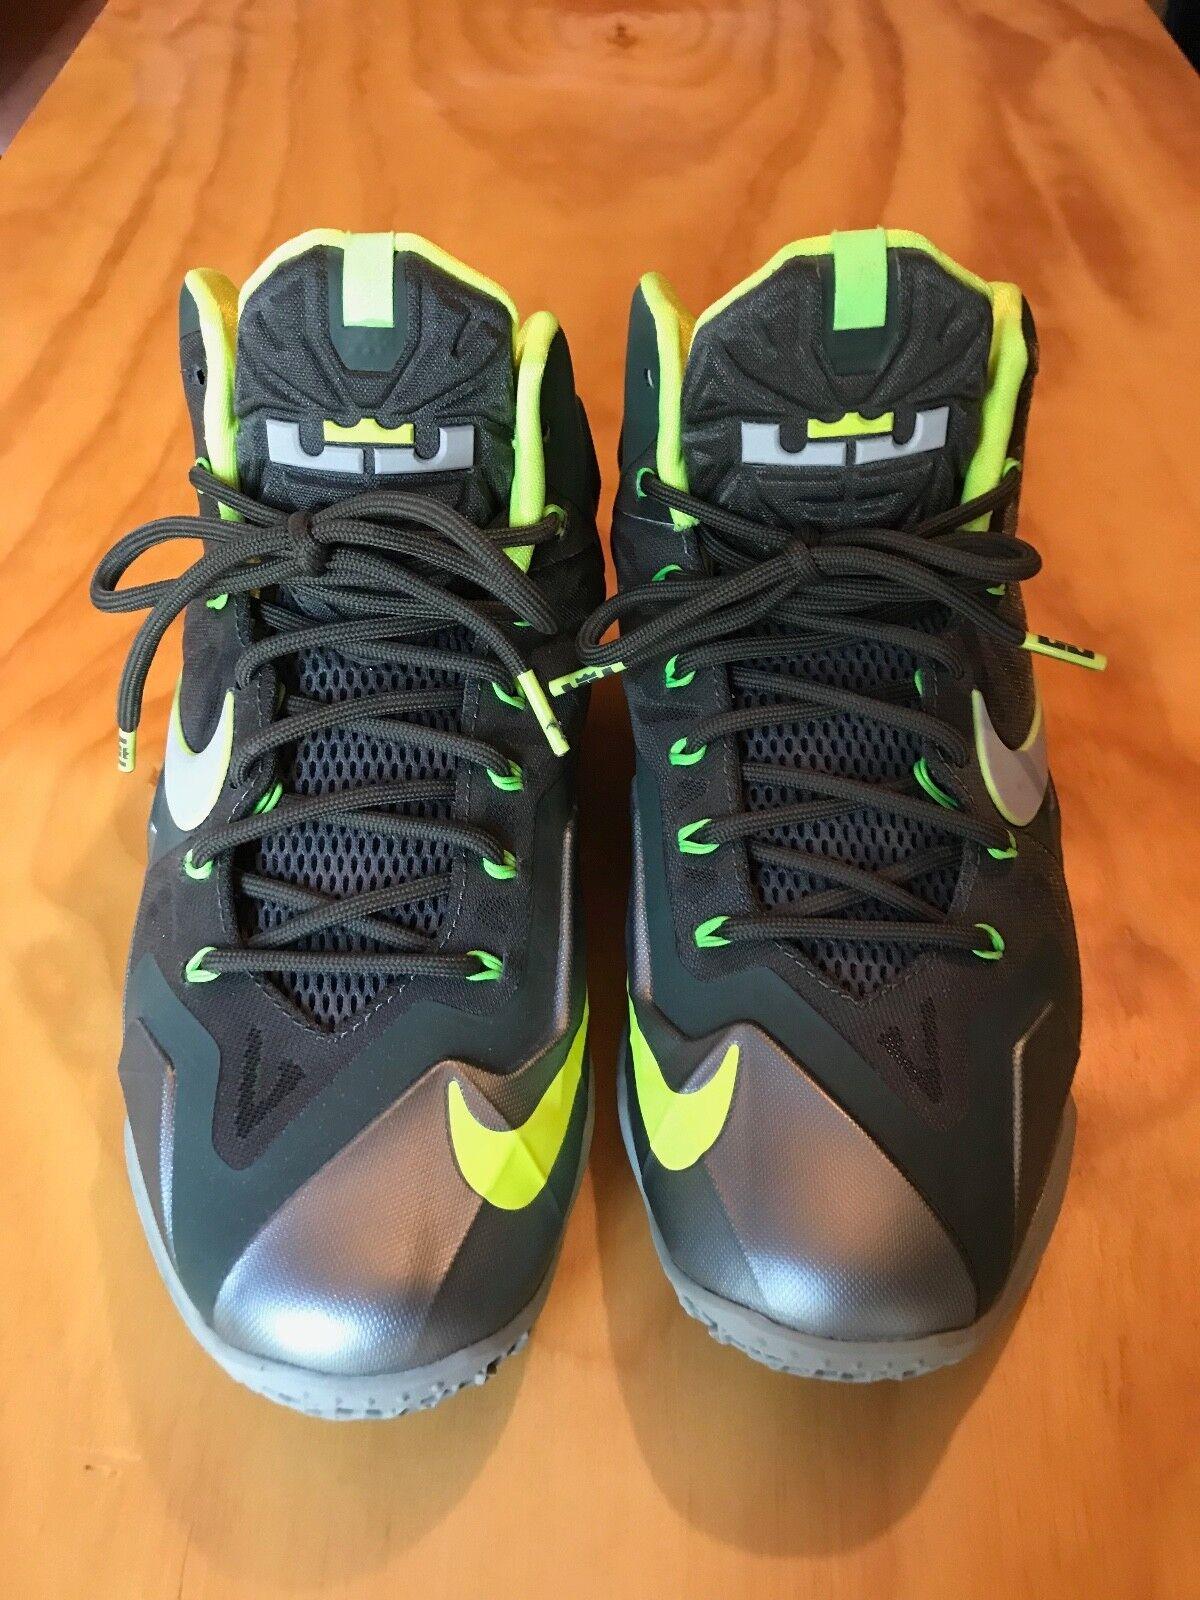 5d3db677546 NIke NIke NIke Lebron X Mens size 8 Sneakers Dunkman Seaweed Atomic Green  cd9a77